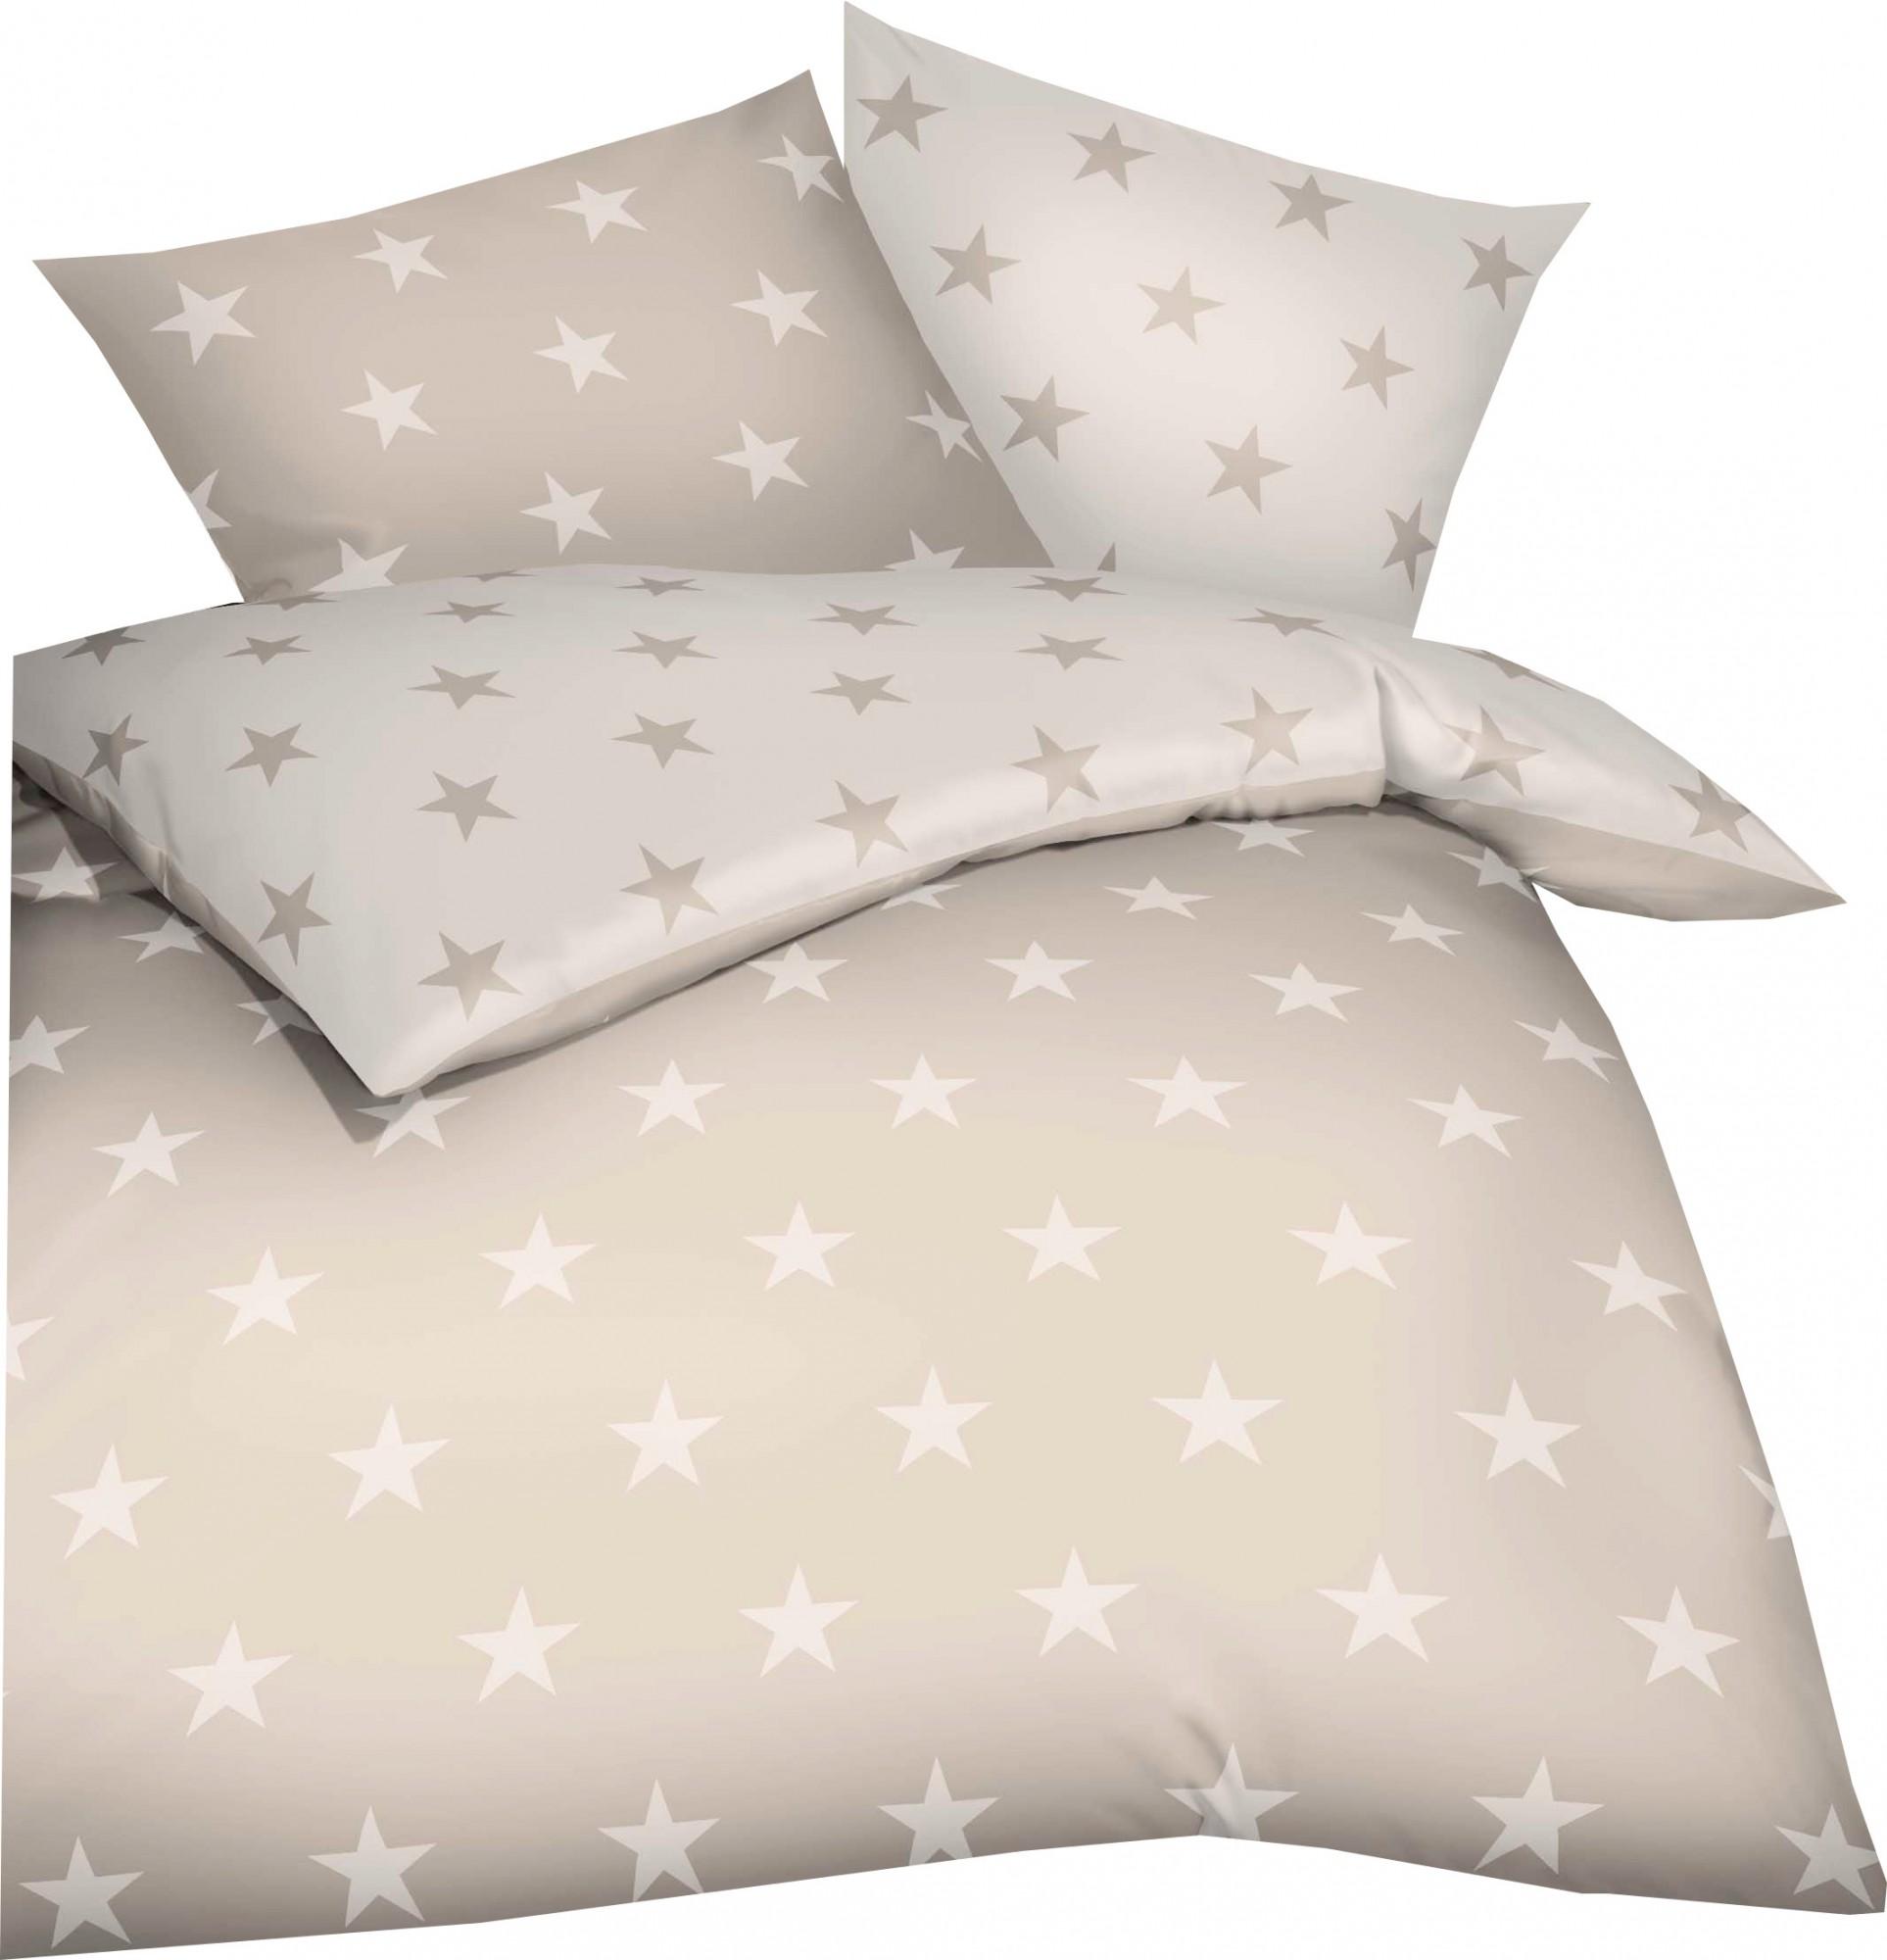 Kaeppel Mako Satin Bettwasche Essential Stars Grosse 200x200 2x80x80